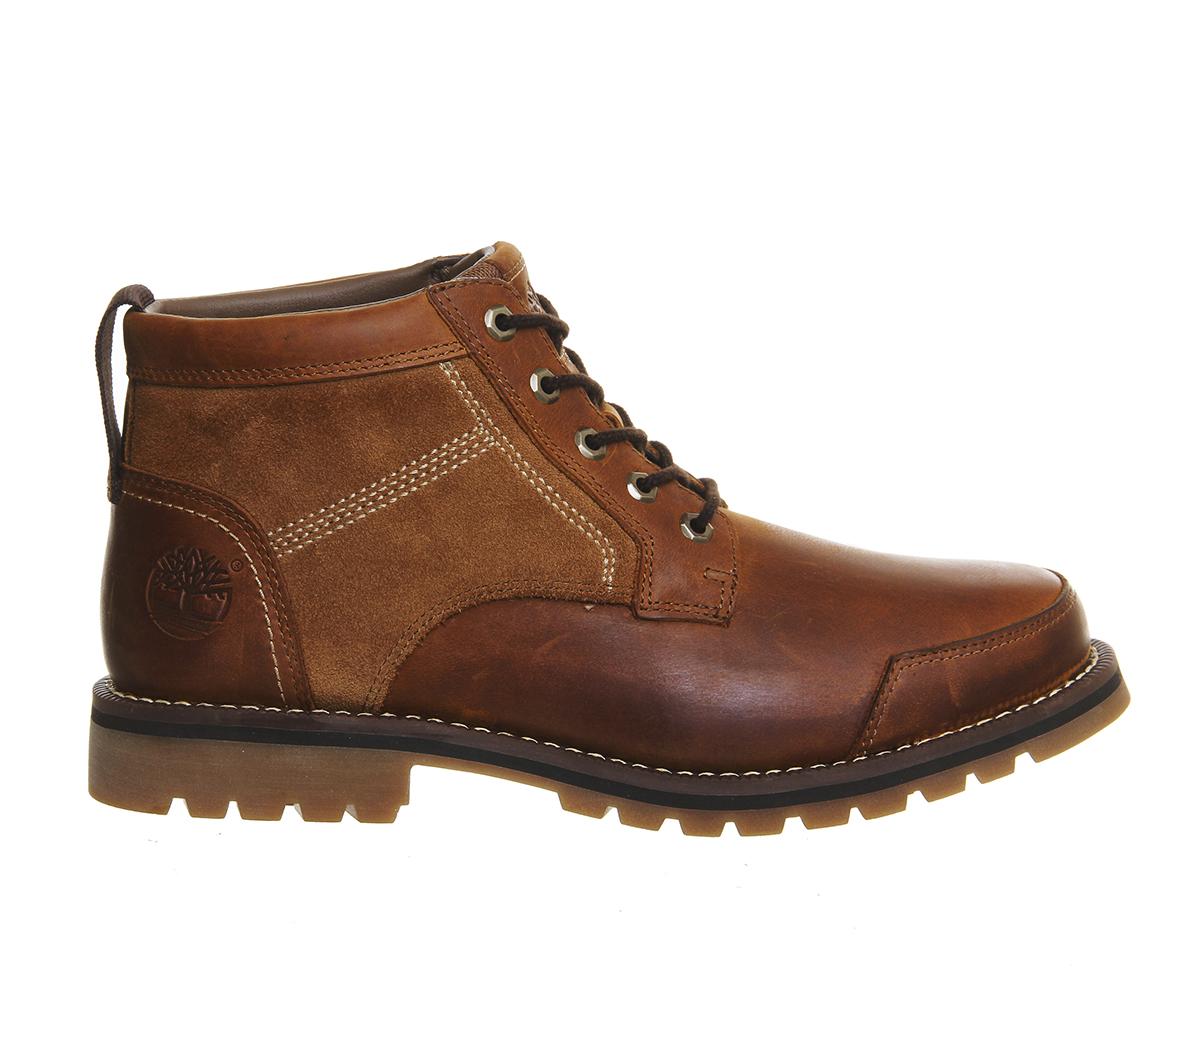 6988304285bb Sentinel Mens Timberland Larchmont Chukka Boots OAKWOOD LEATHER Boots